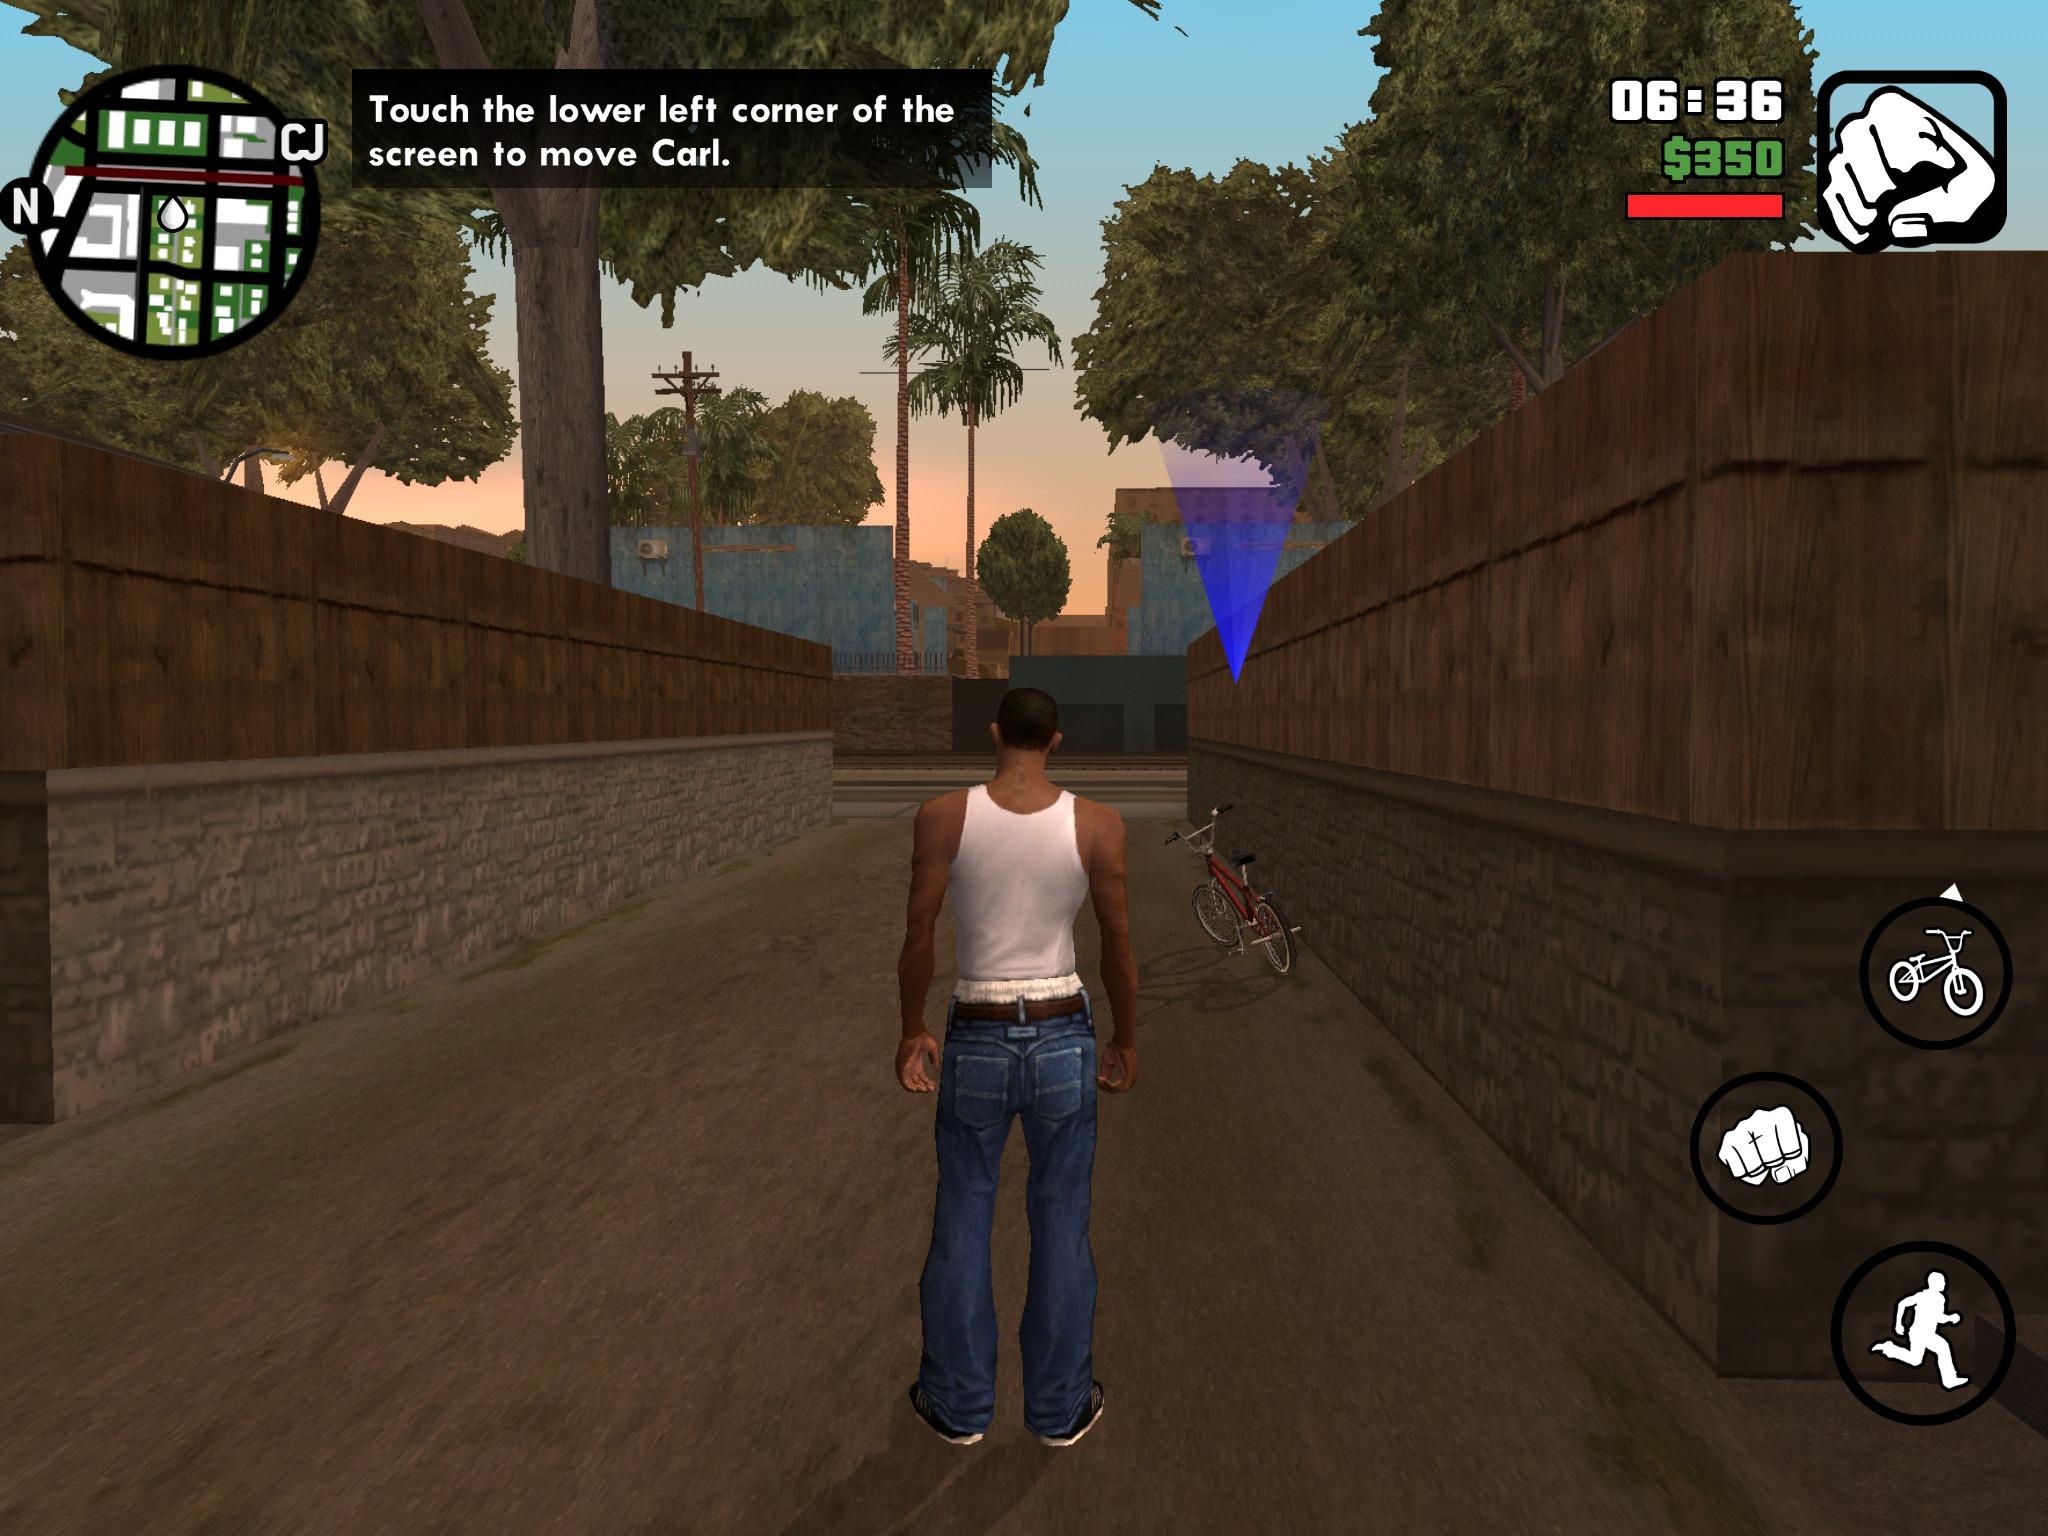 GTA: San Andreas (iOS)